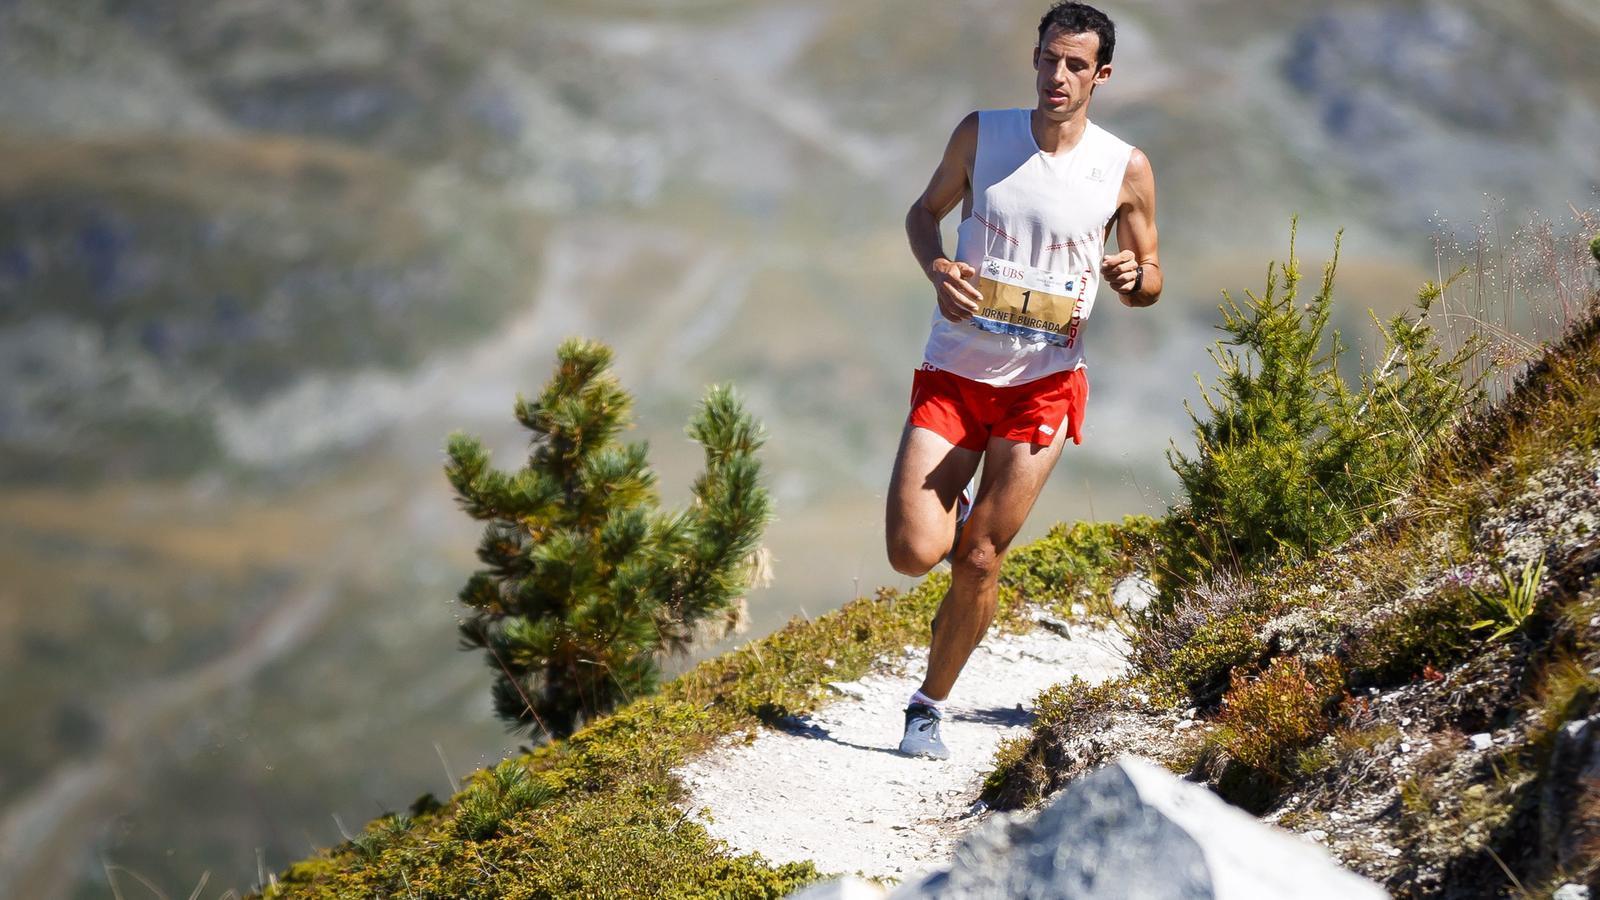 Kilian Jornet guanya per sisena vegada a la Sierre-Zinal